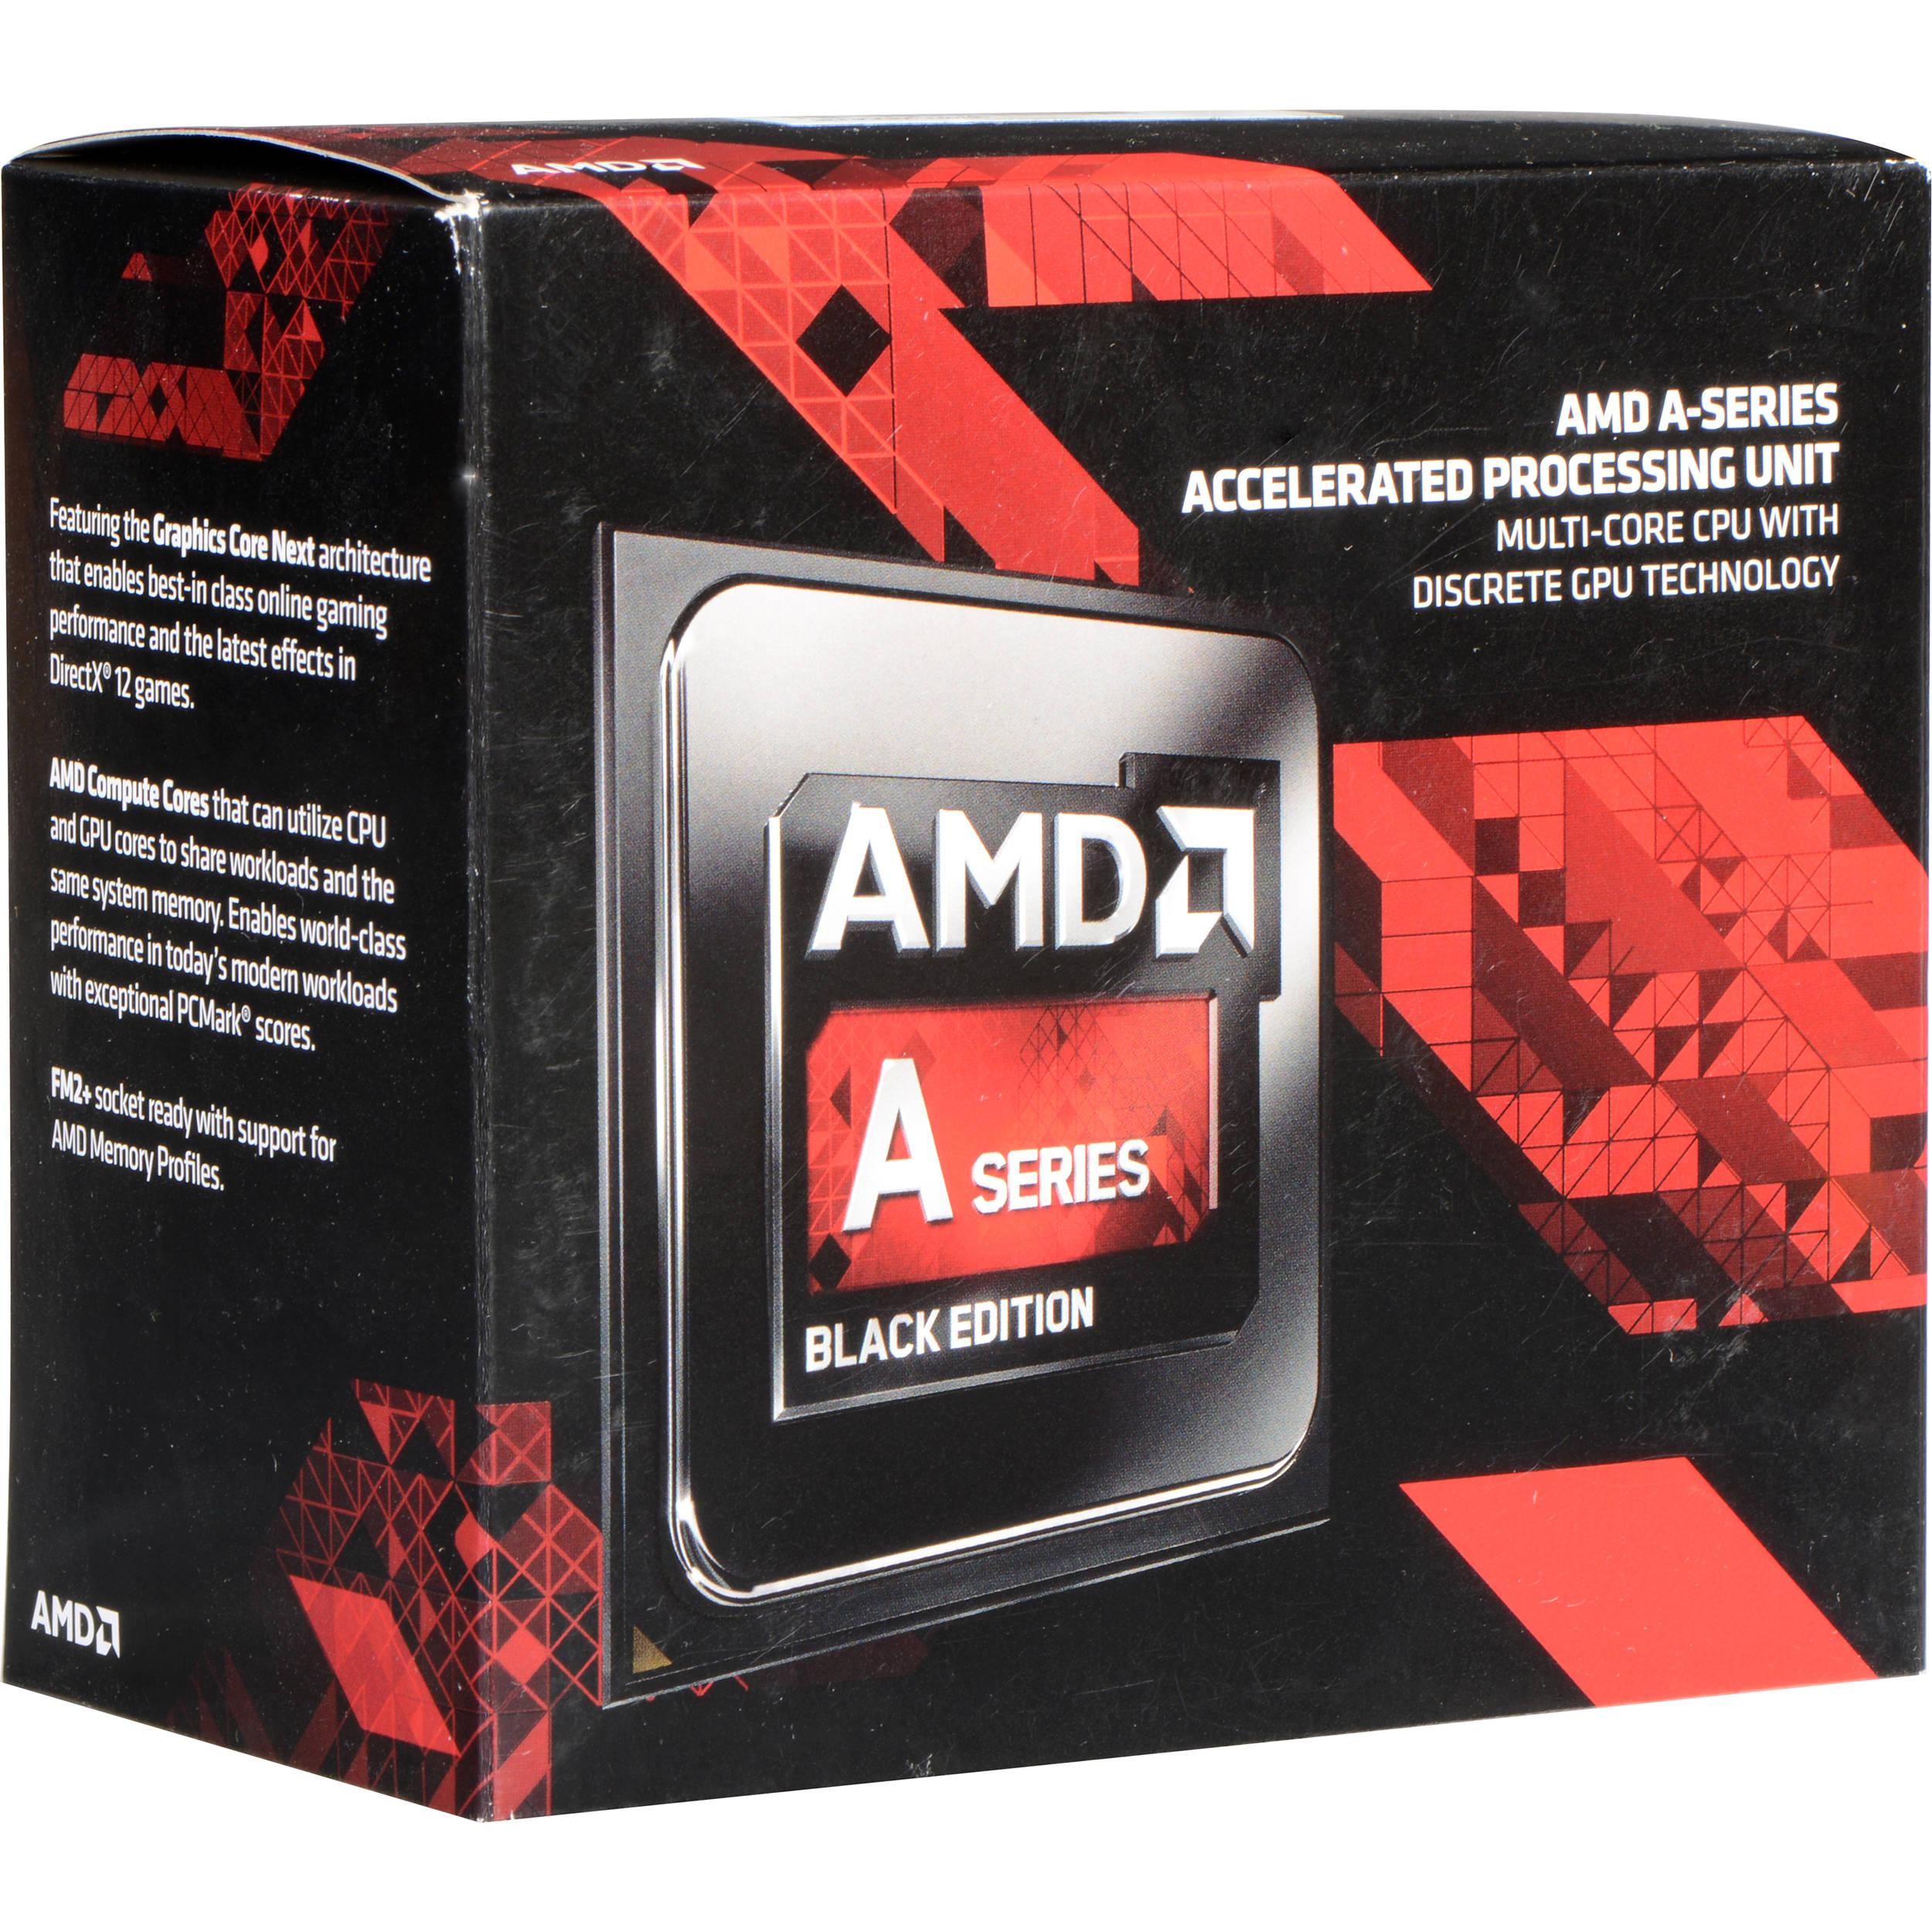 amd quad core a10 9700p processor